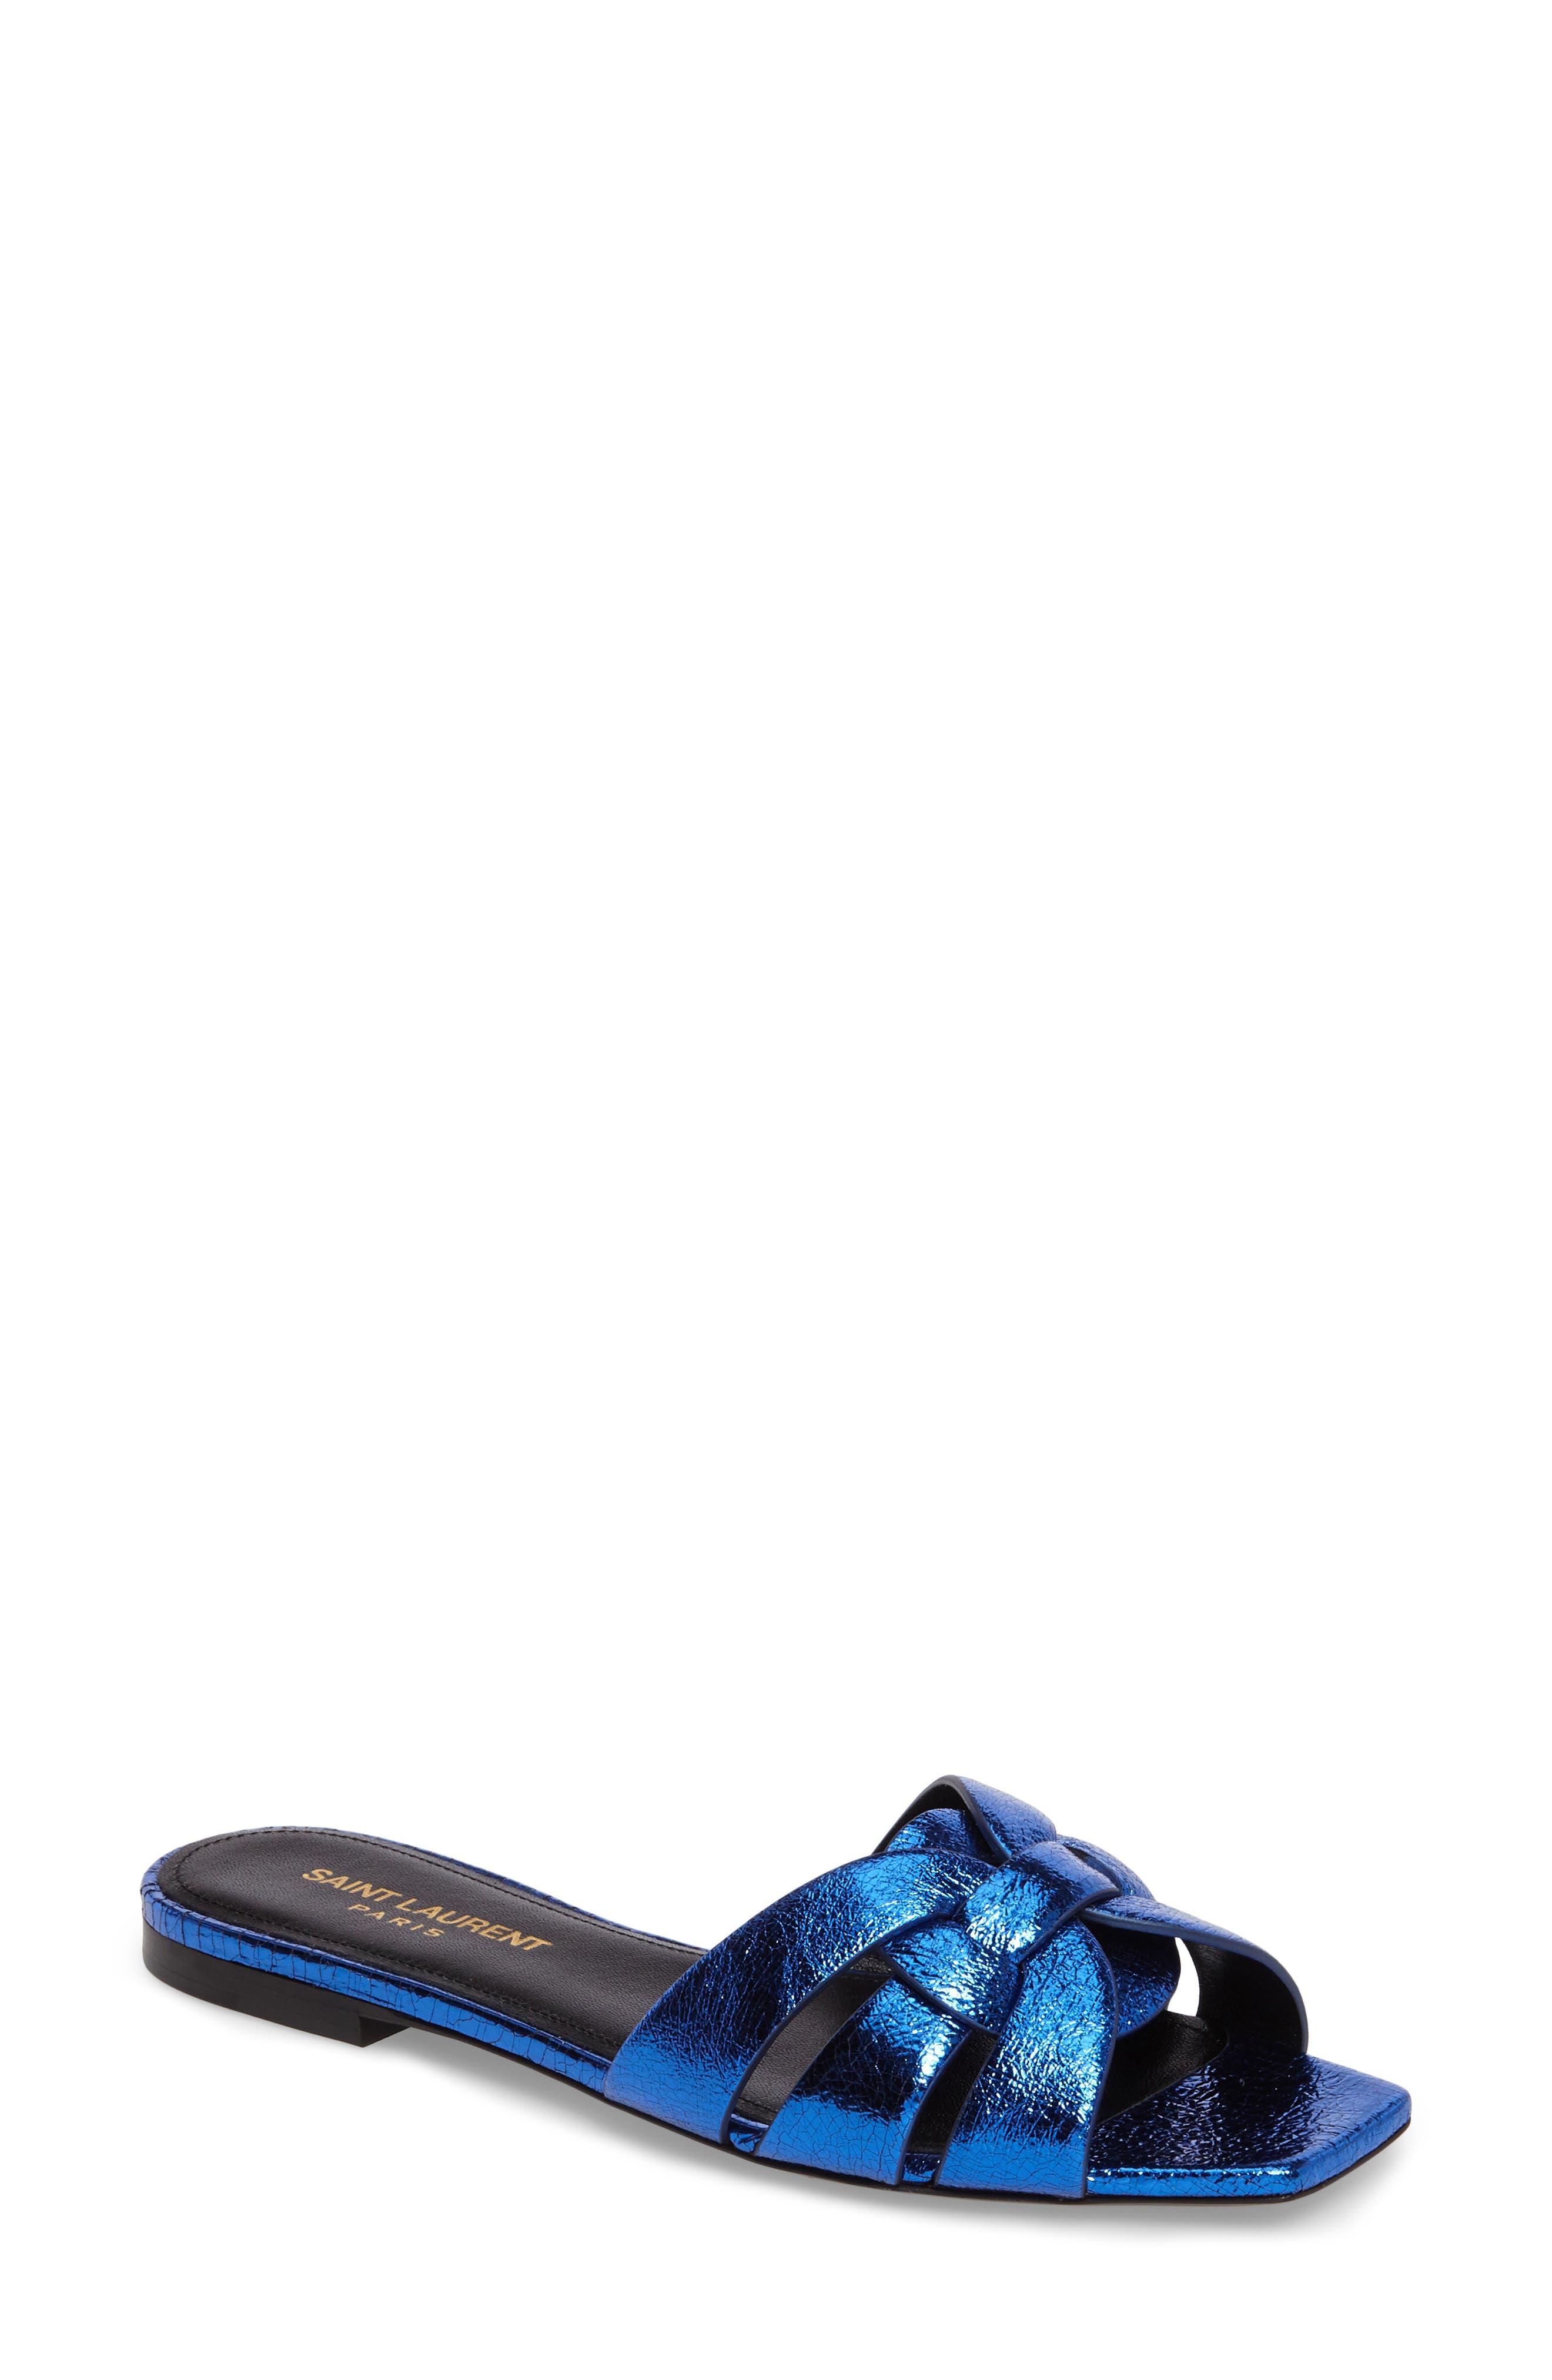 Pieds Metallic Slide Sandal,                             Main thumbnail 1, color,                             450